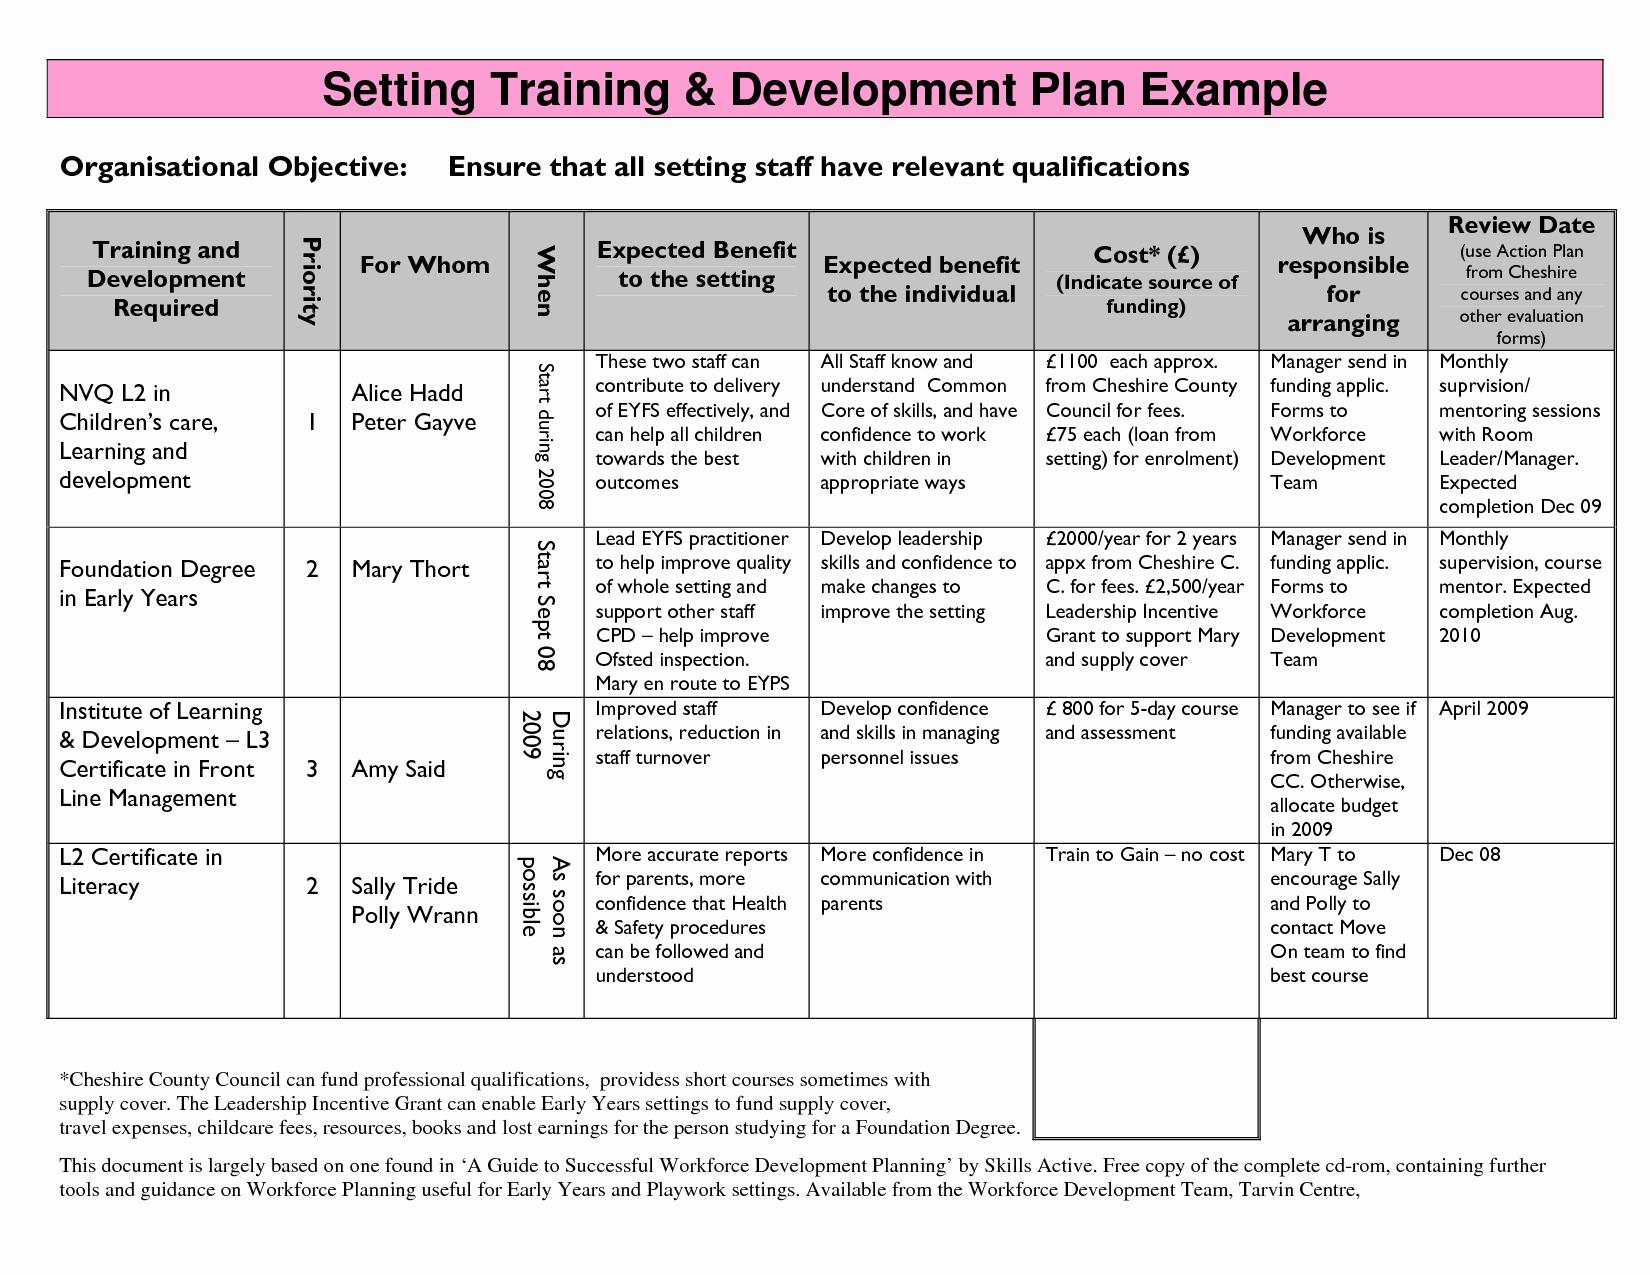 Design and Development Plan Template Inspirational 17 Developing A Design Proposal Shipley Proposal